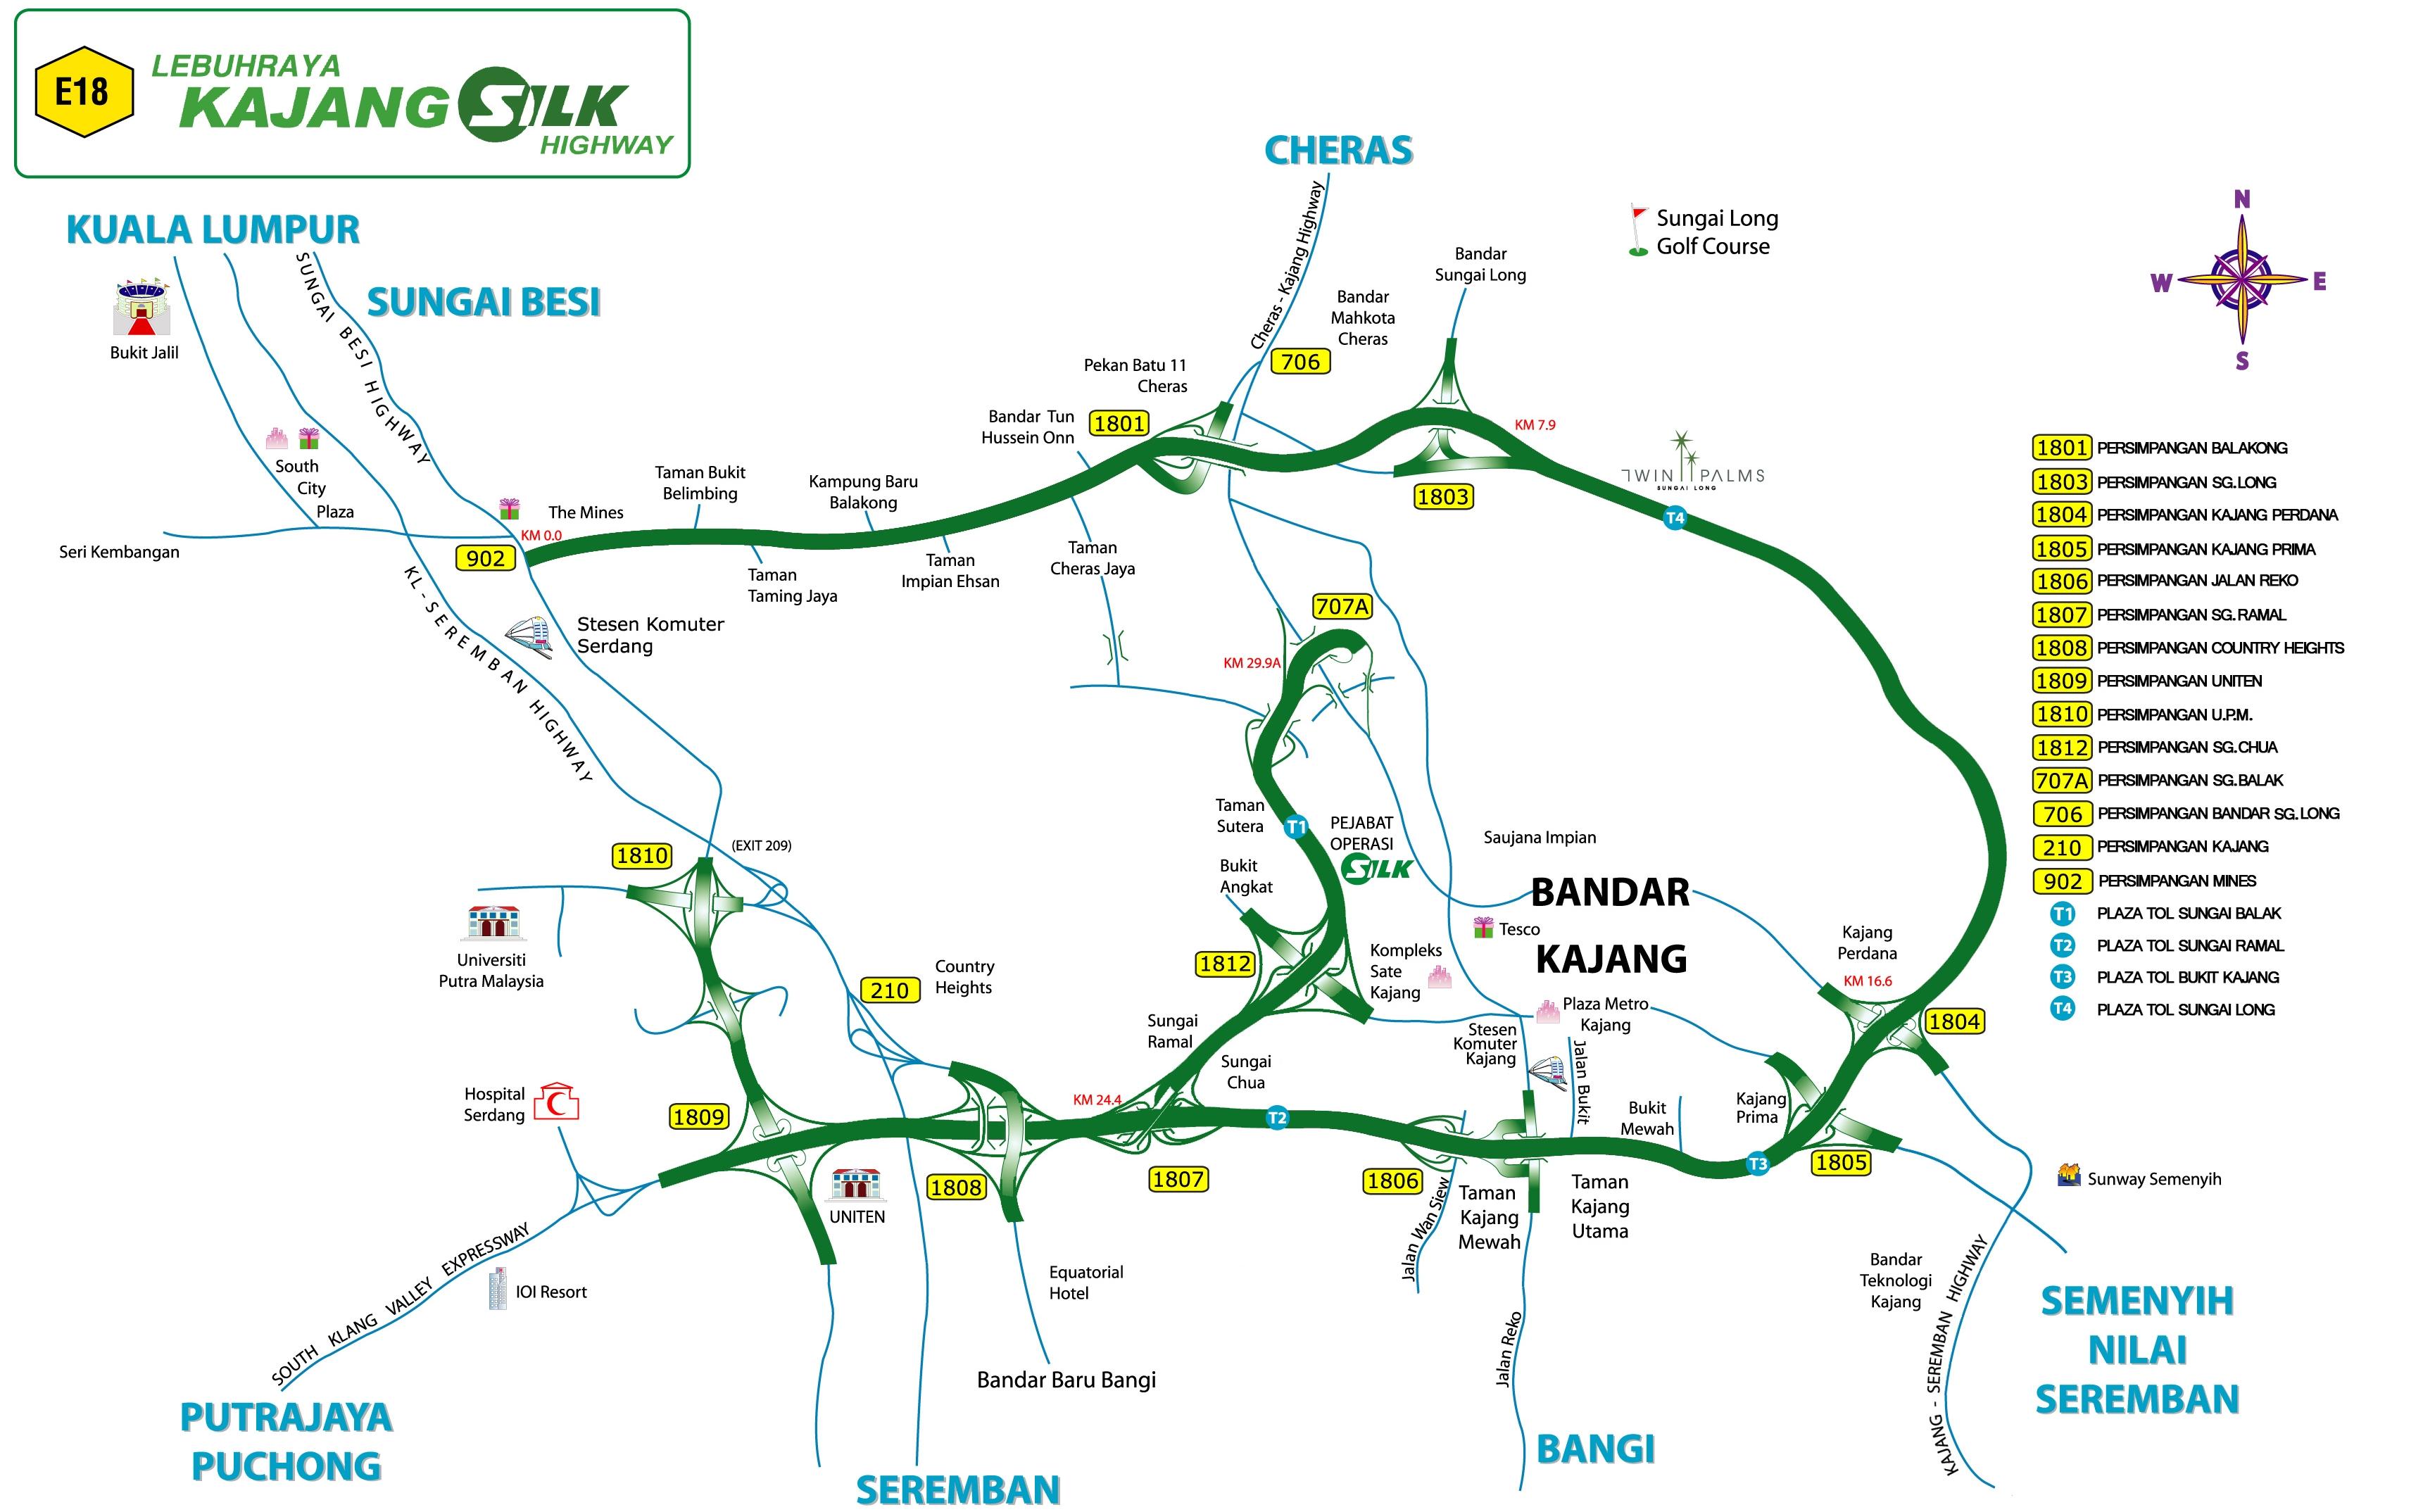 Kajang SILK Highway – toll rates go up on October 15 Paul Tan ...